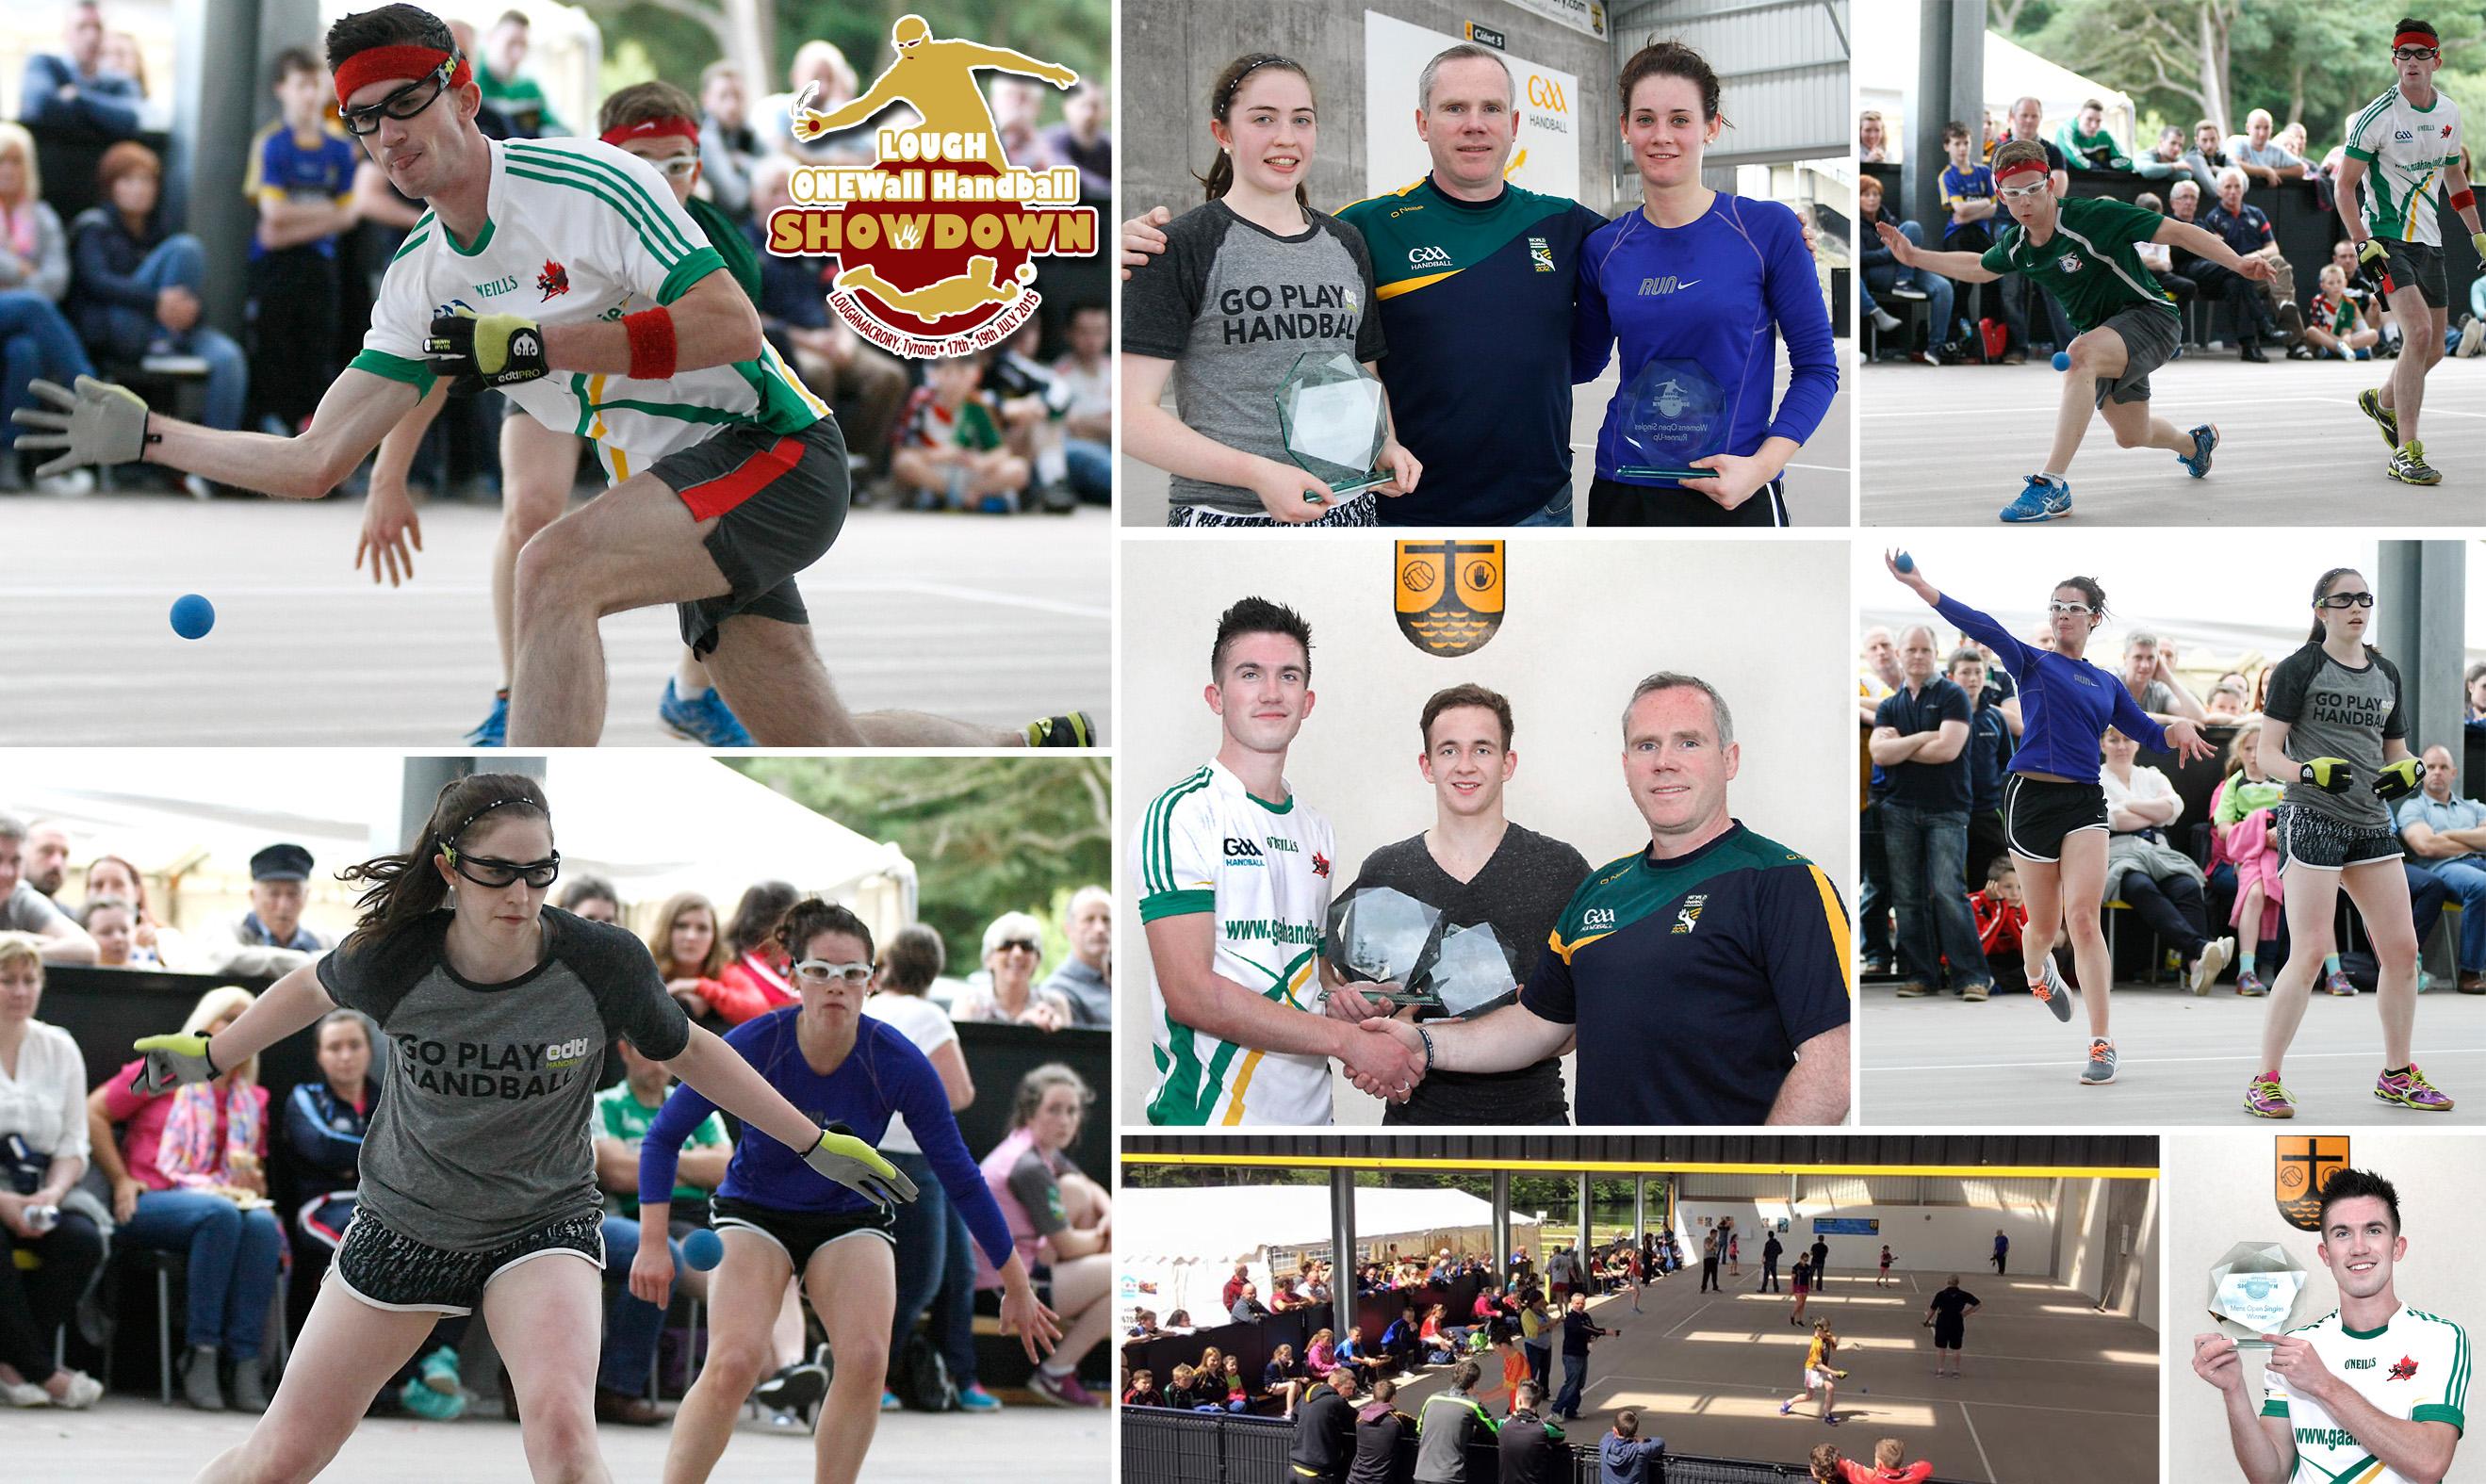 Lough One Wall Showdown provides feast of GAA Handball action